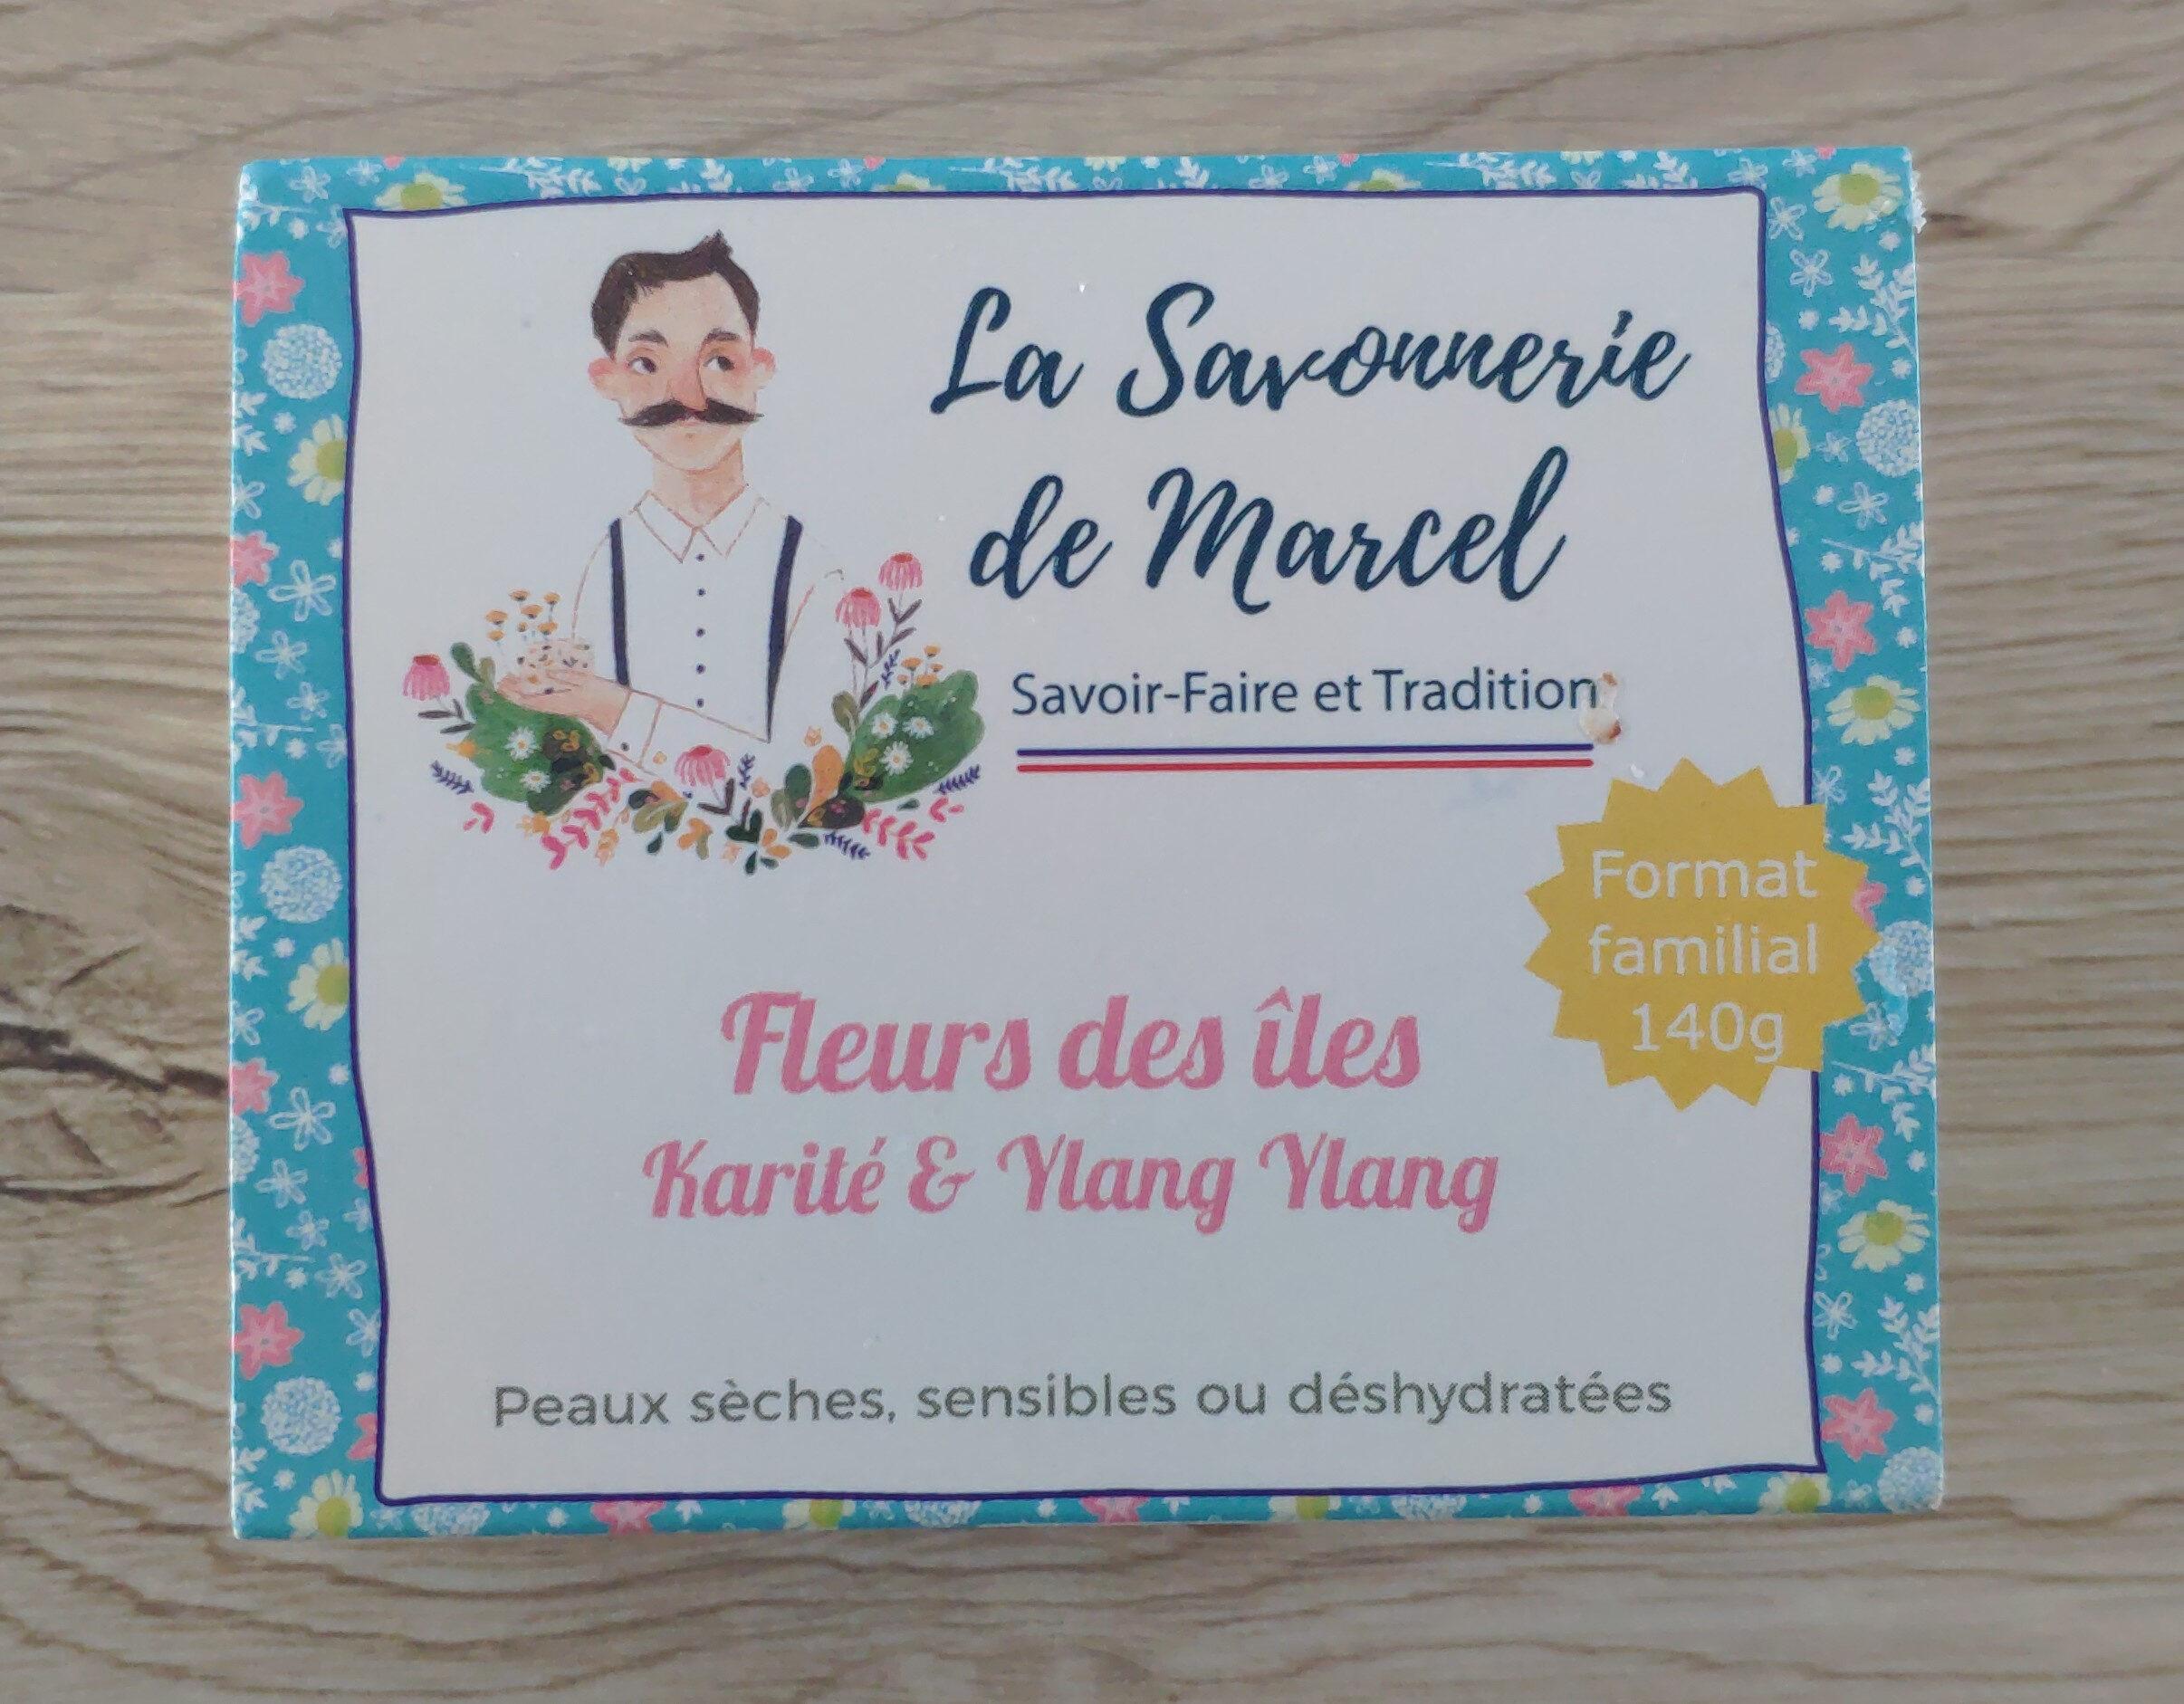 Savon Fleurs des îles - Karité & Ylang Ylang - Продукт - fr